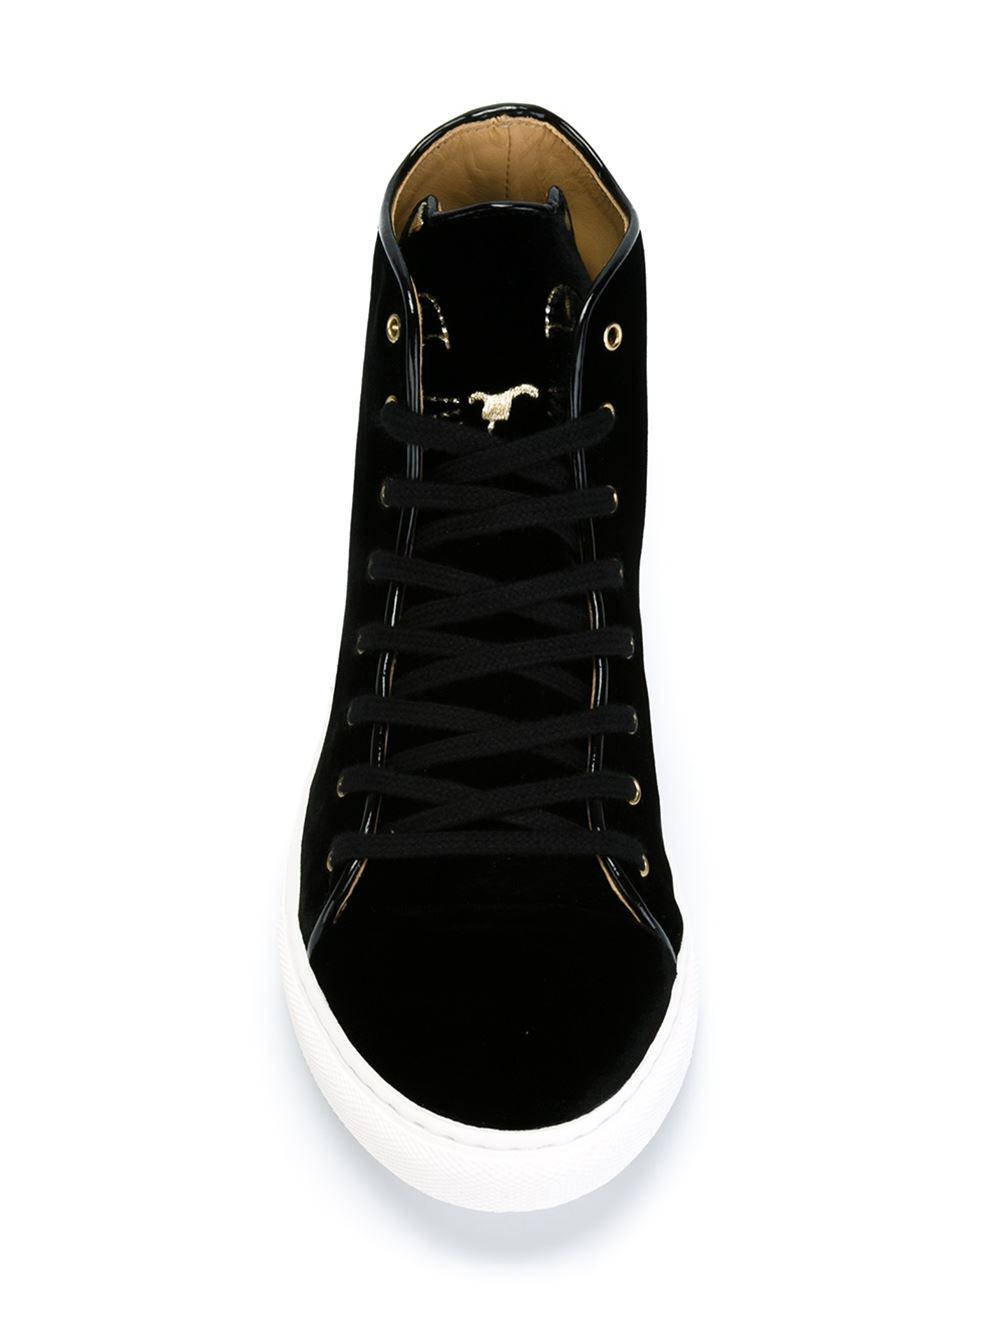 Charlotte Olympia Velvet 'purrrfect' High-top Sneakers in Black